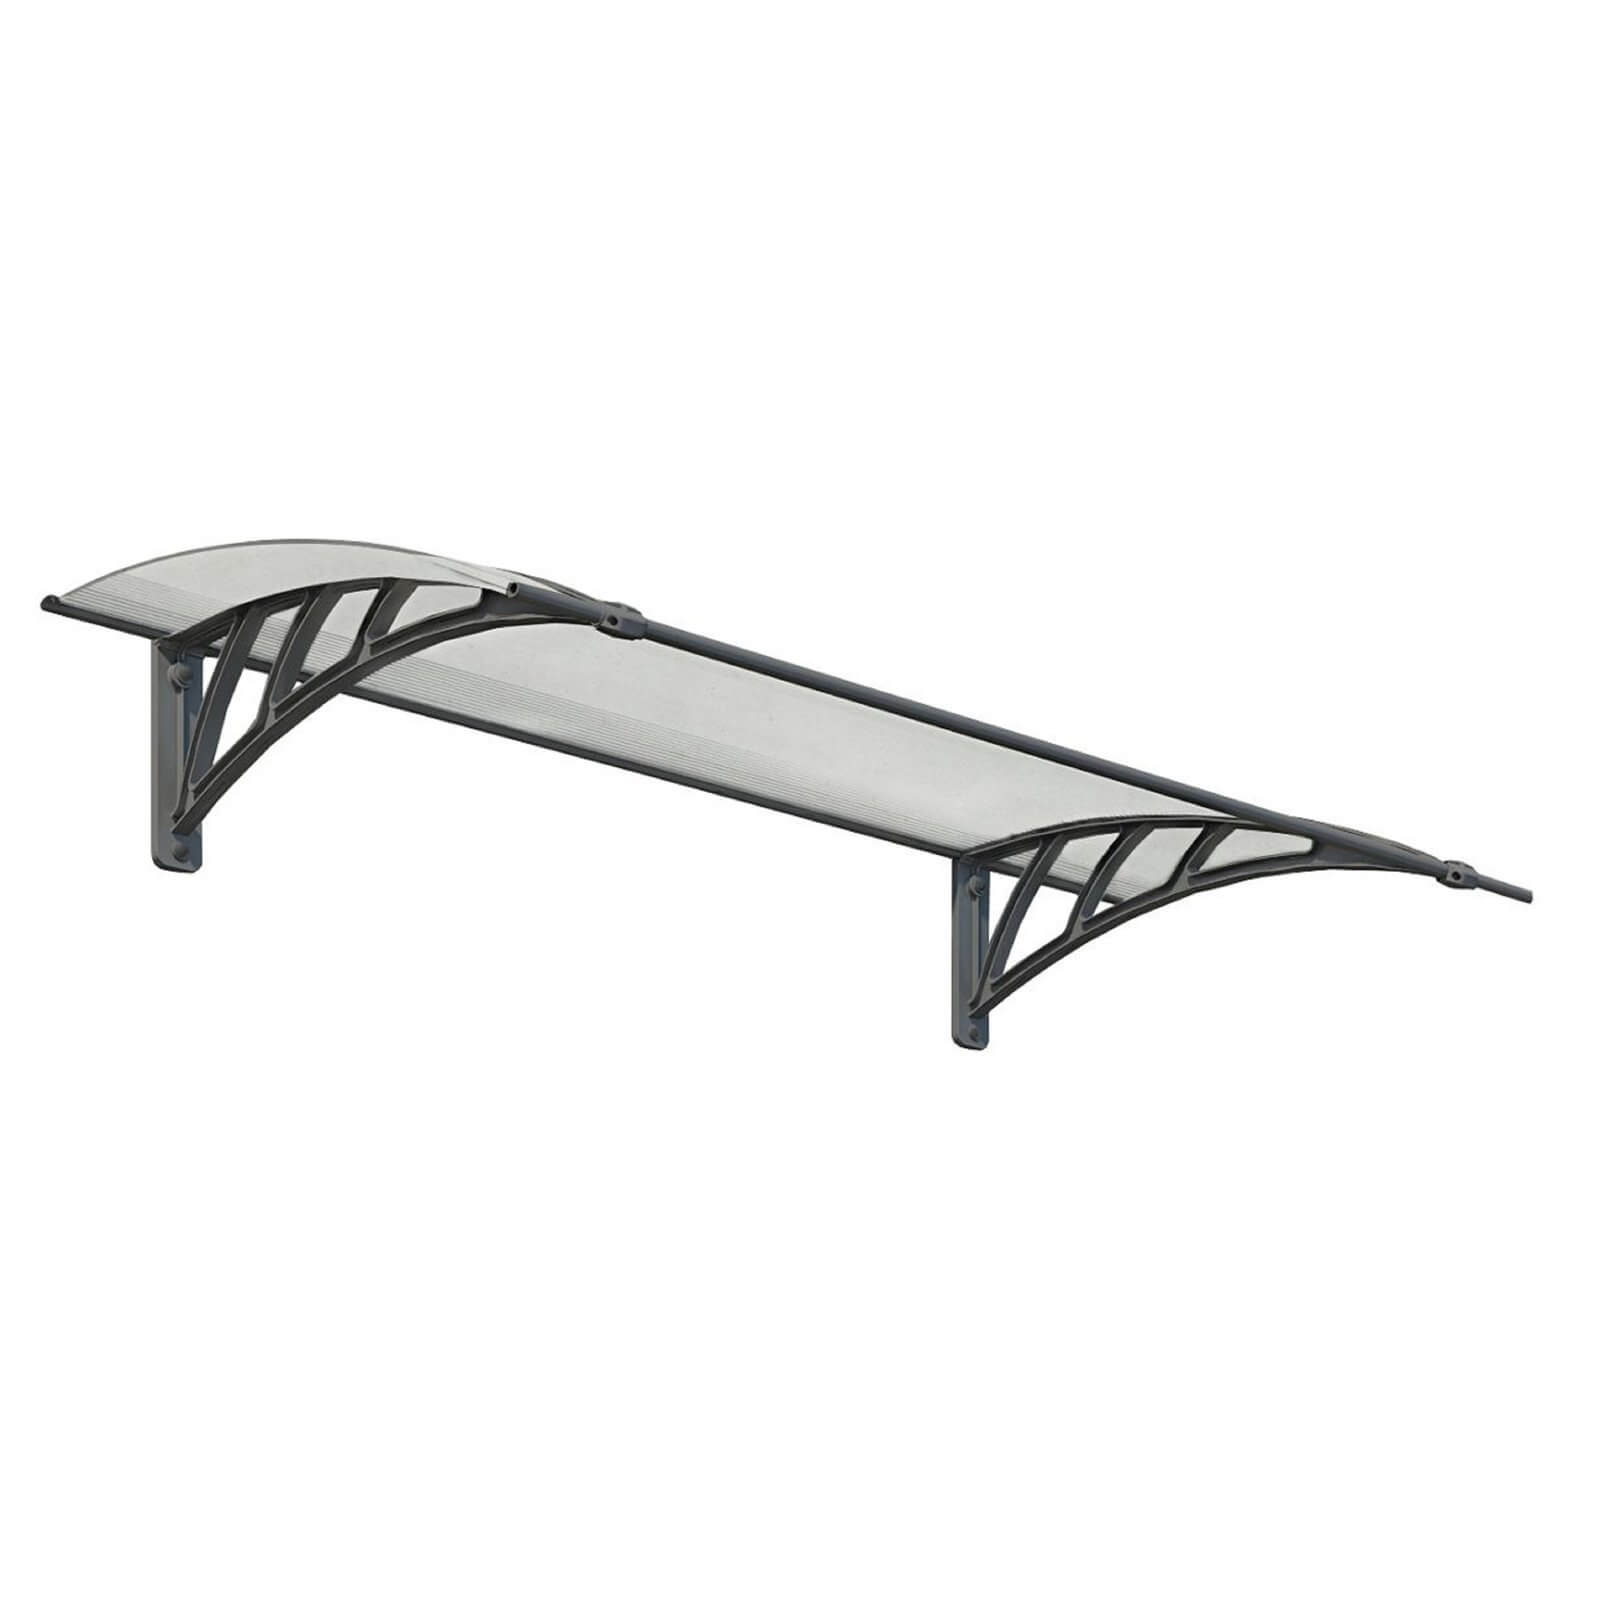 Palram - Canopia Canopy Neo 1350 Grey Twinwall